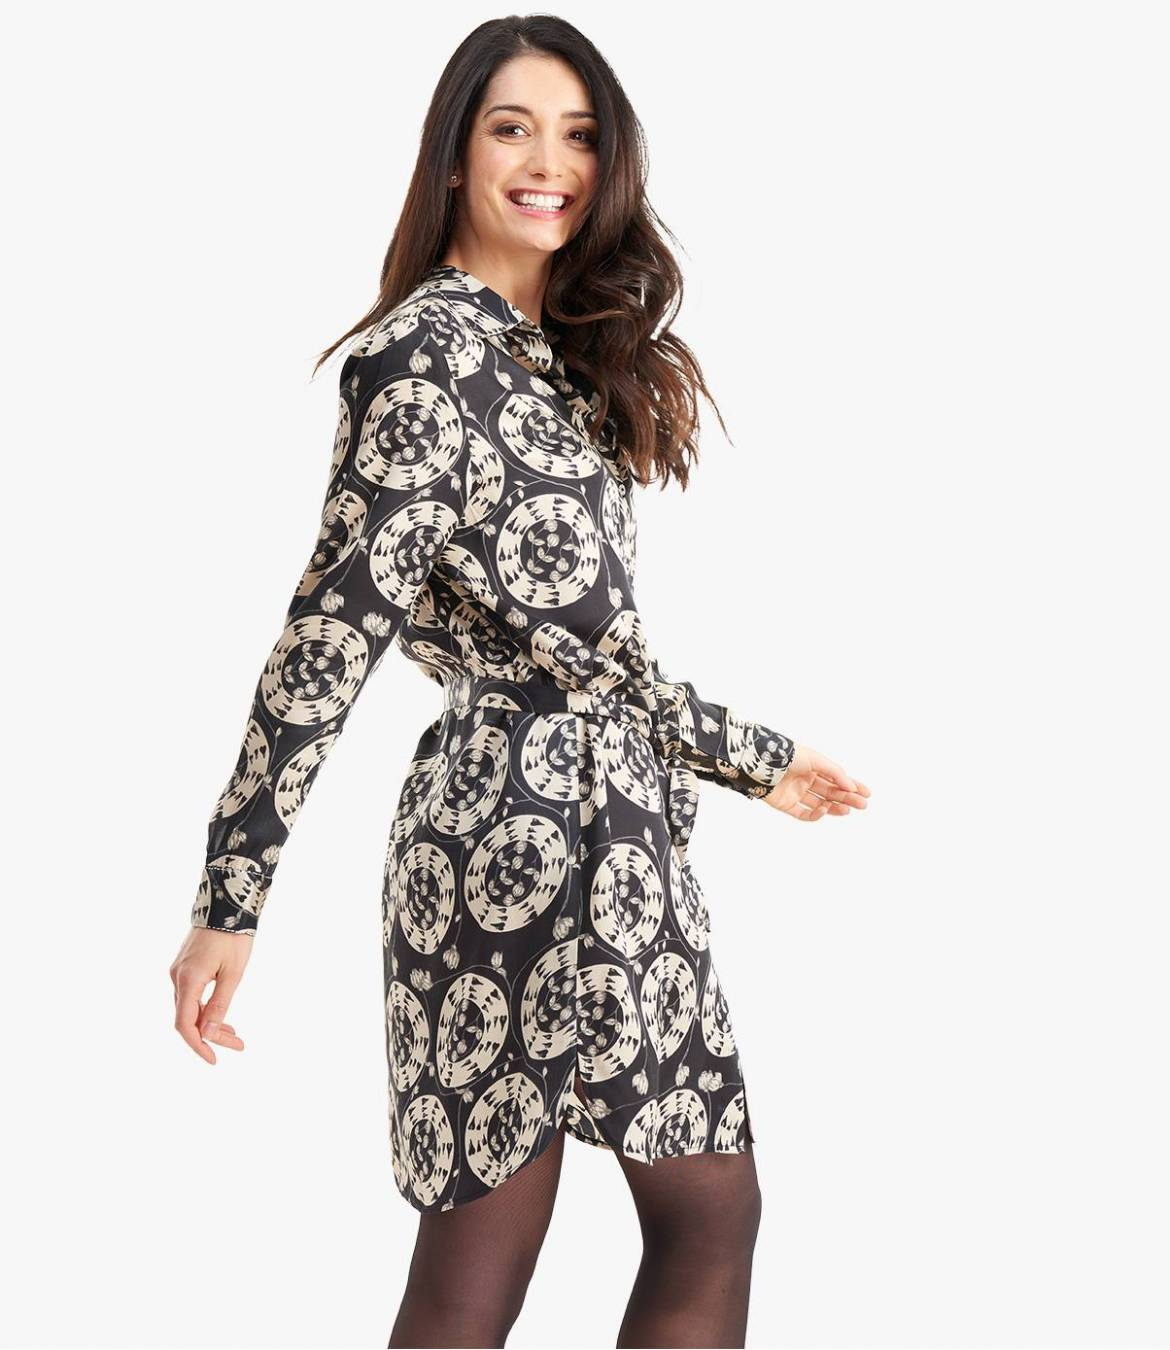 KAIA EVE Robe en Modal satin pour Femme - 3